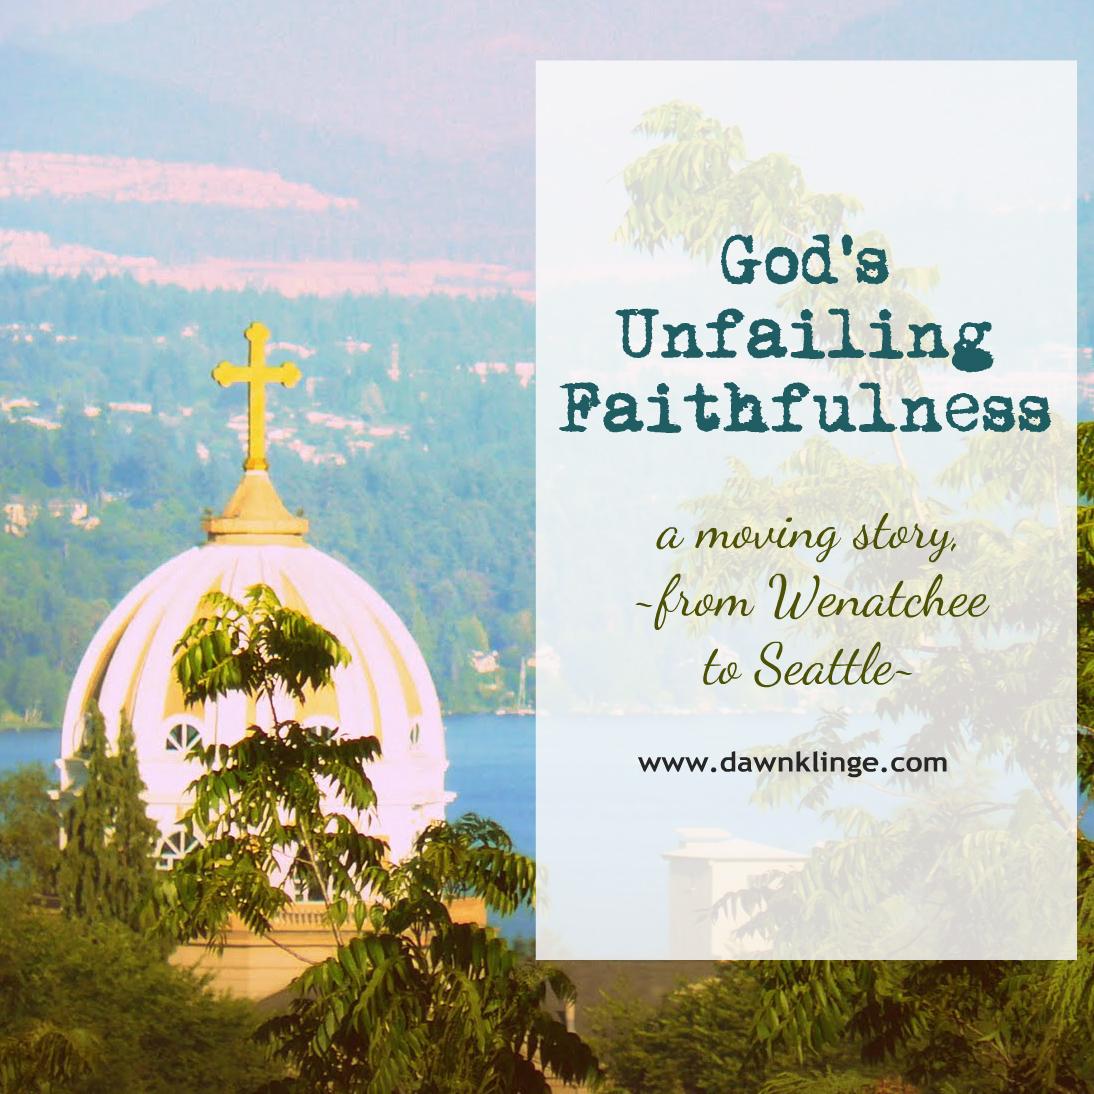 God's Unfailing Faithfulness:  the move from Wenatchee to Seattle